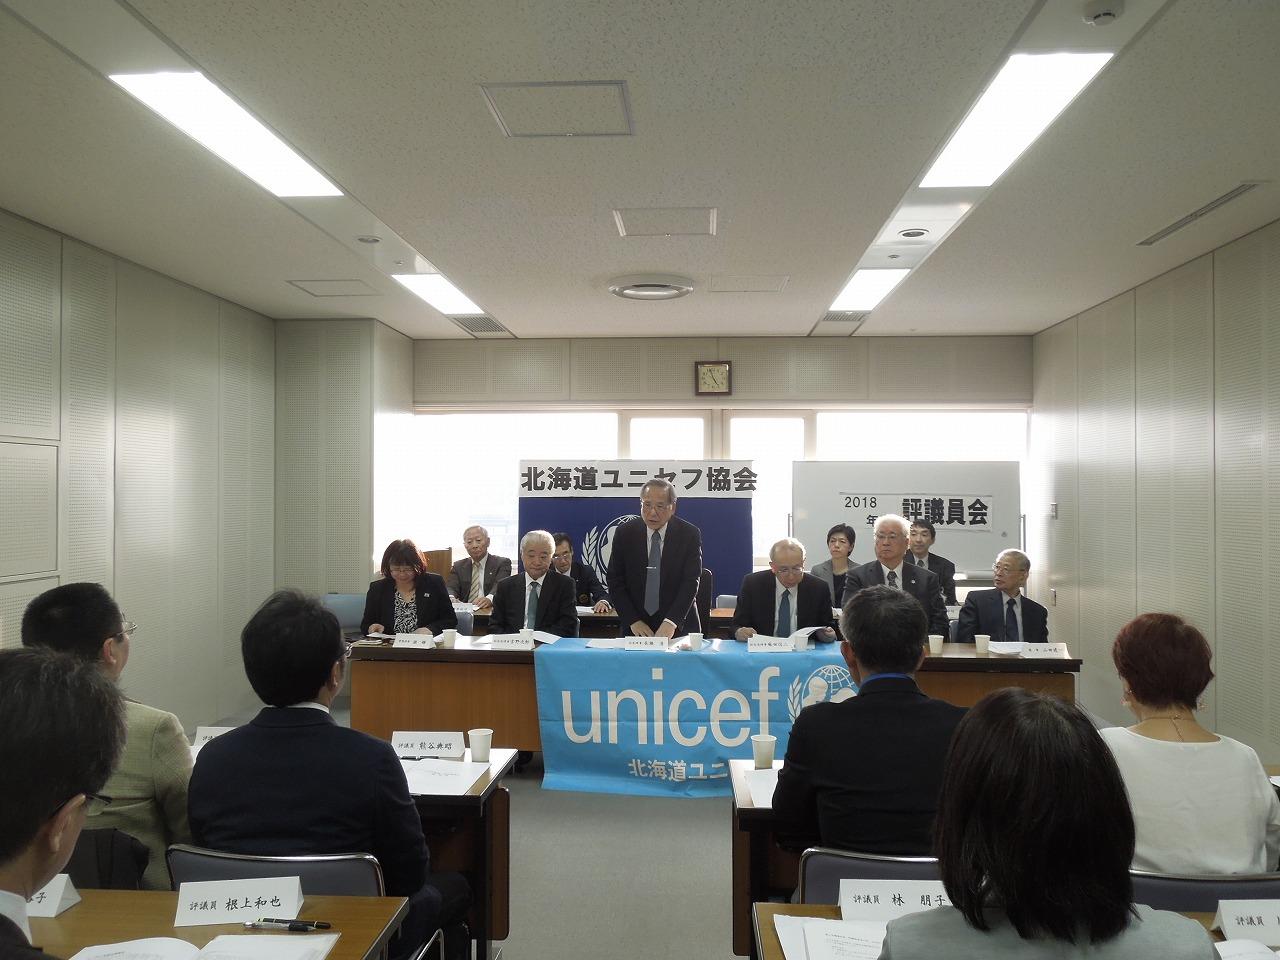 http://www.unicef-hokkaido.jp/img/DSCN7323.jpg